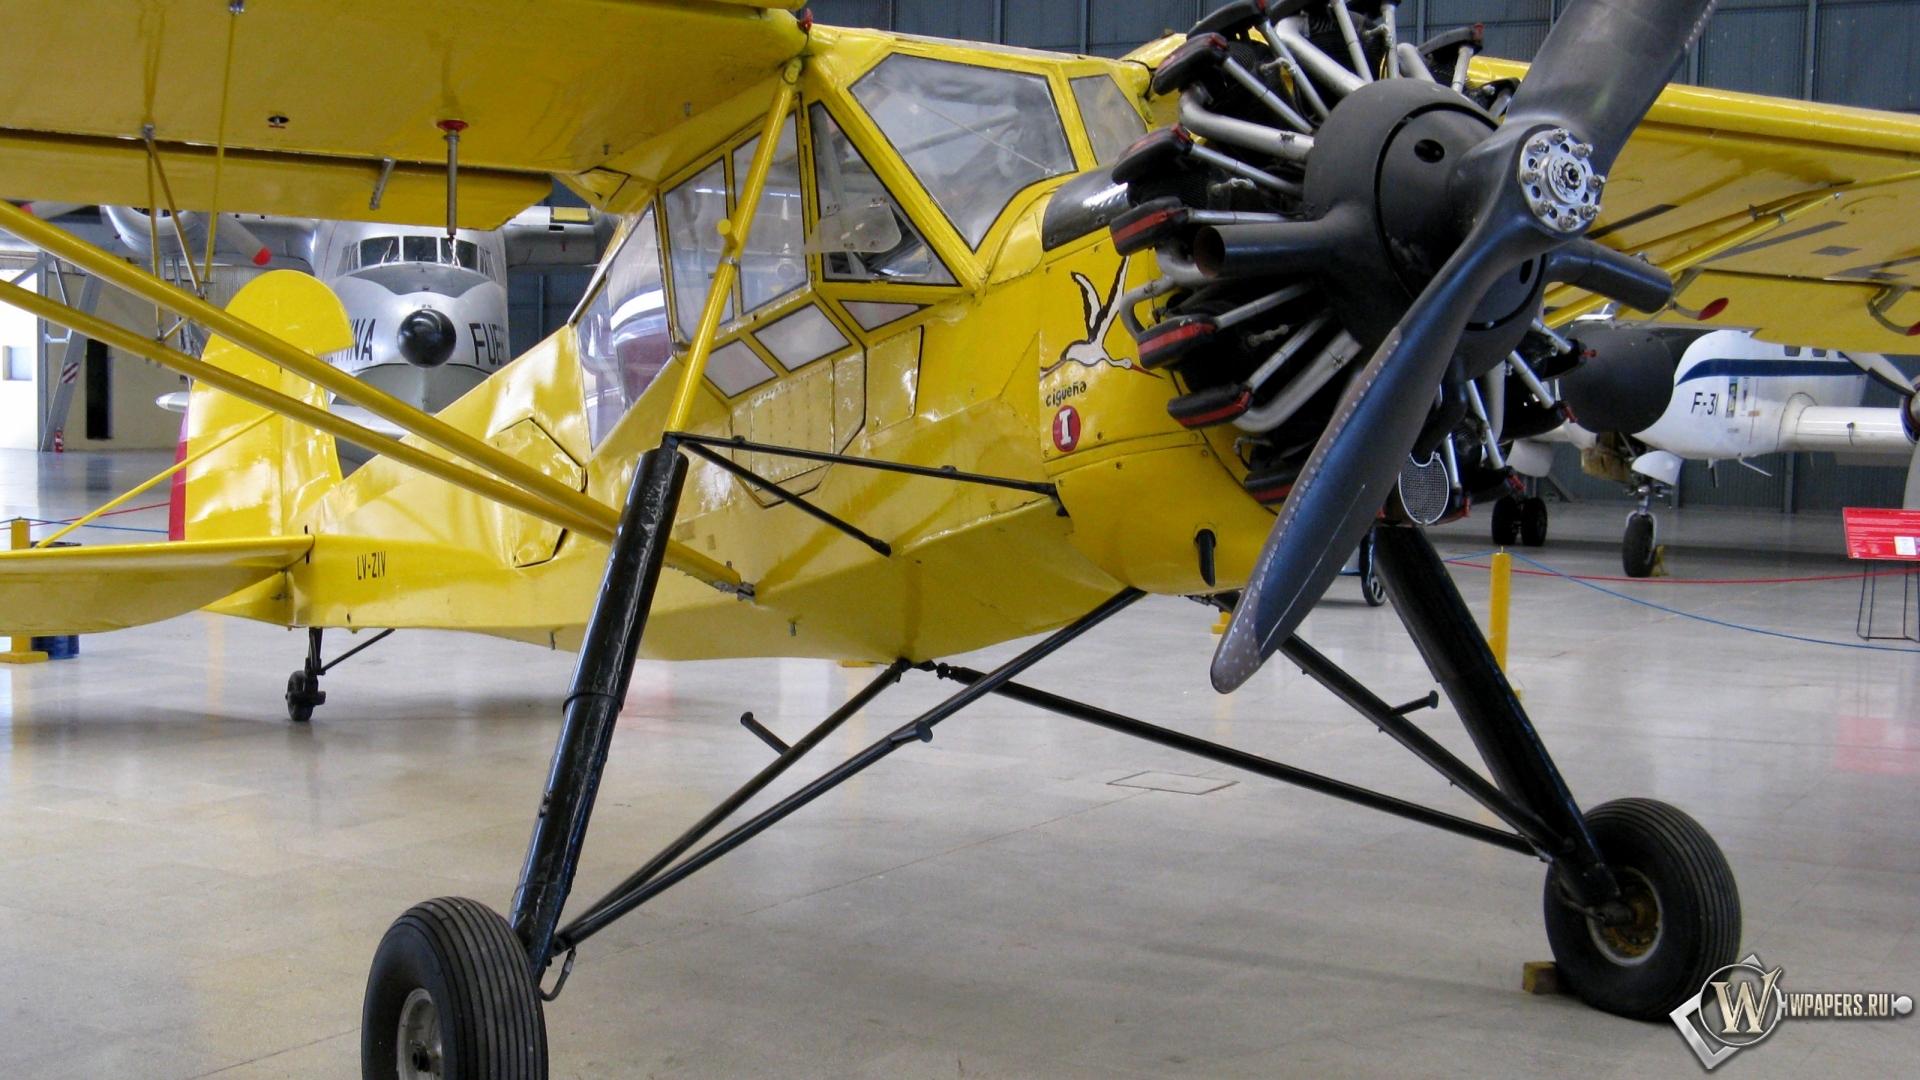 Fieseler Storch Fi-156 1920x1080